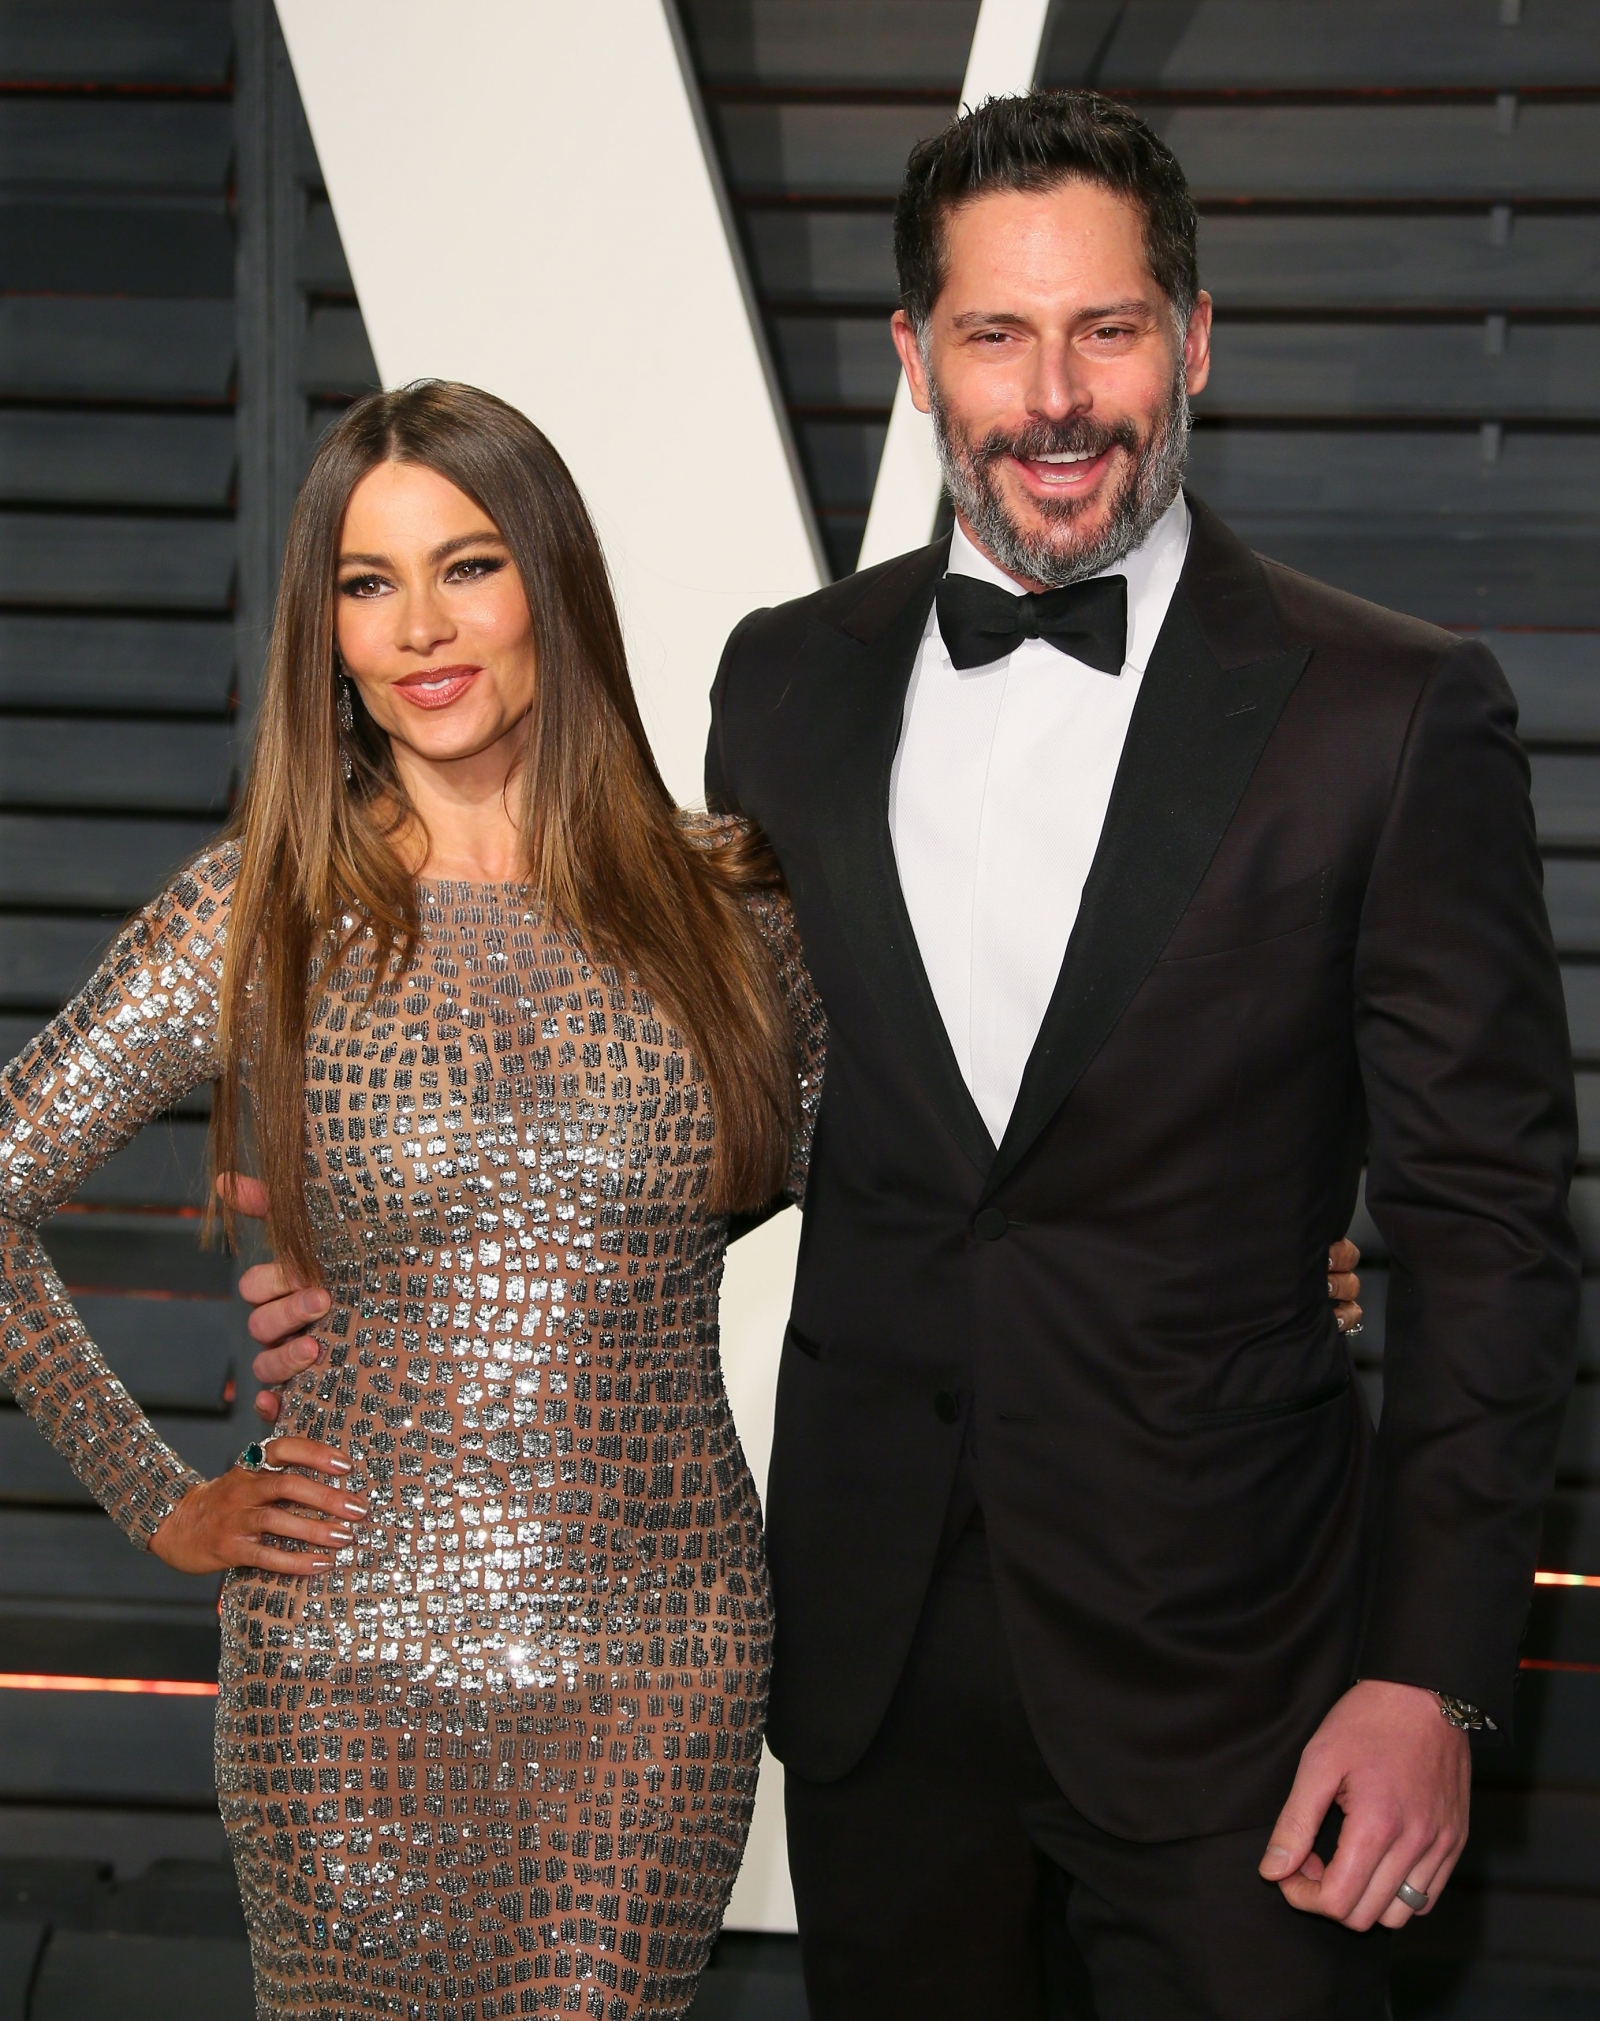 Sofia Vergara and Joe Manganiello